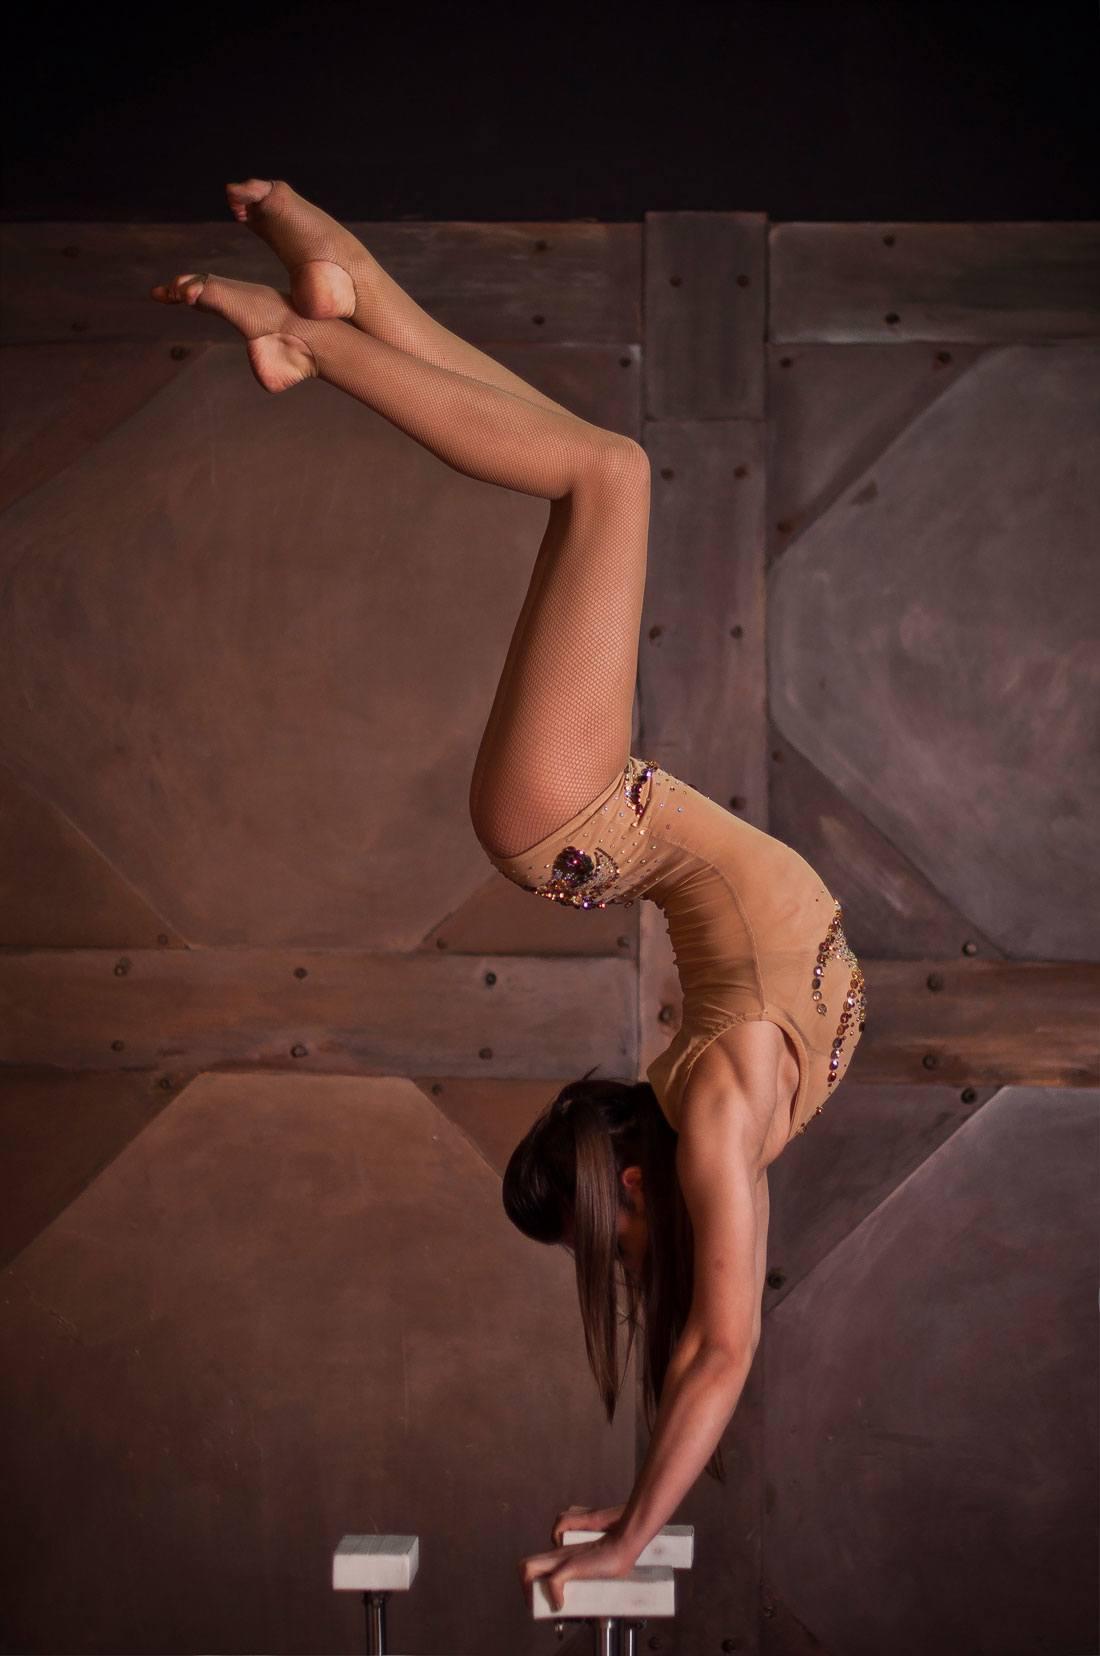 Rimma Griadunova balance